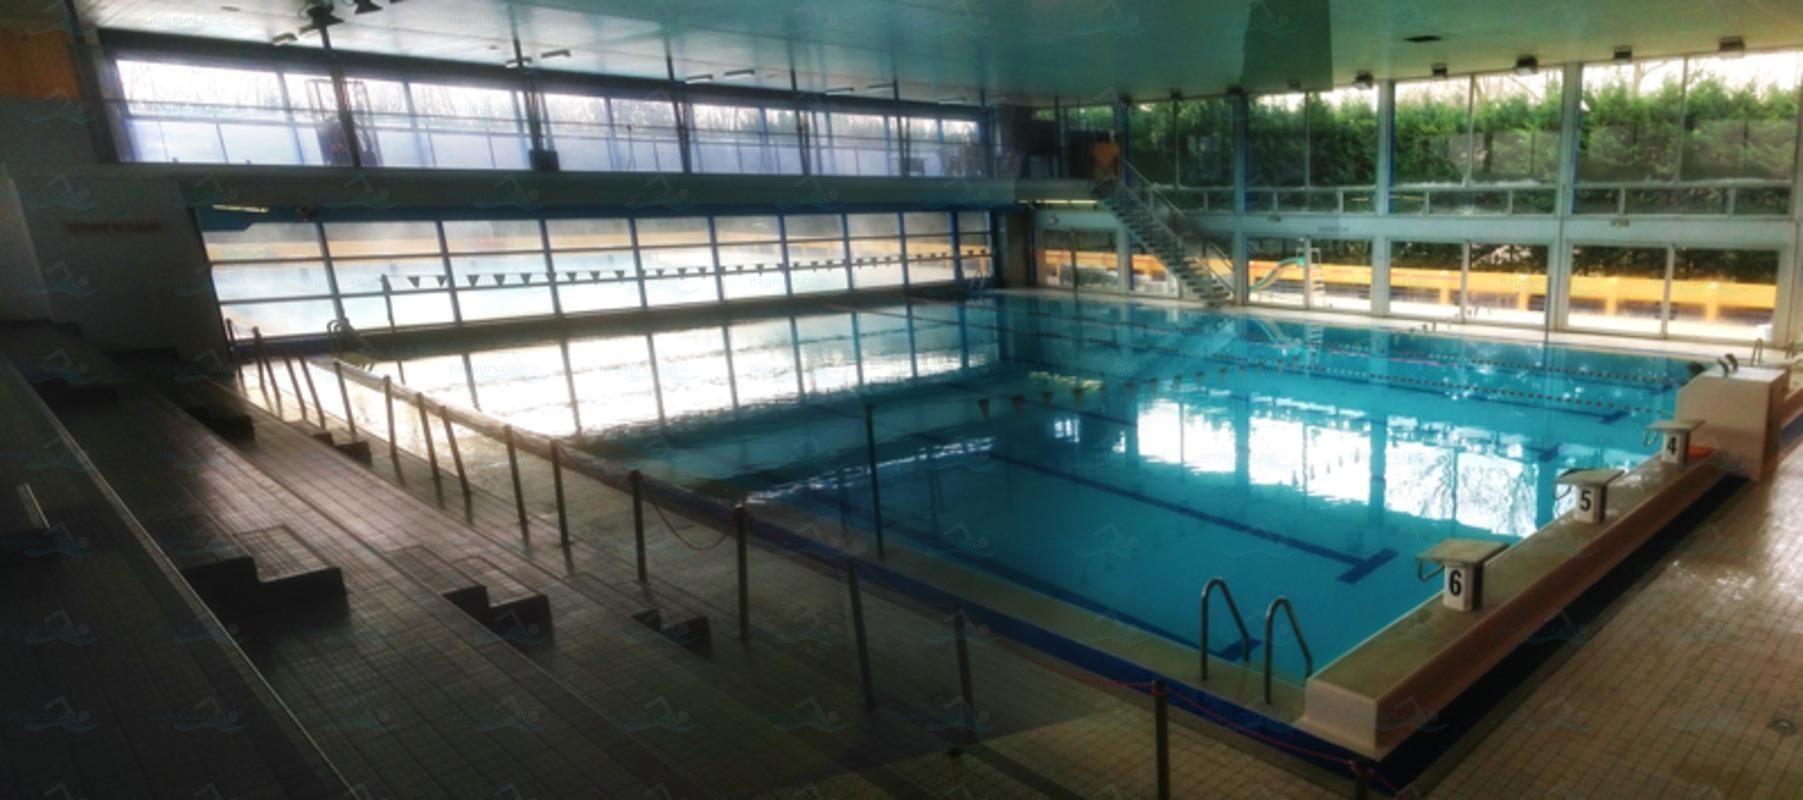 Le guide des 2 piscines de villeneuve la garenne - Piscine youri gagarine villejuif ...